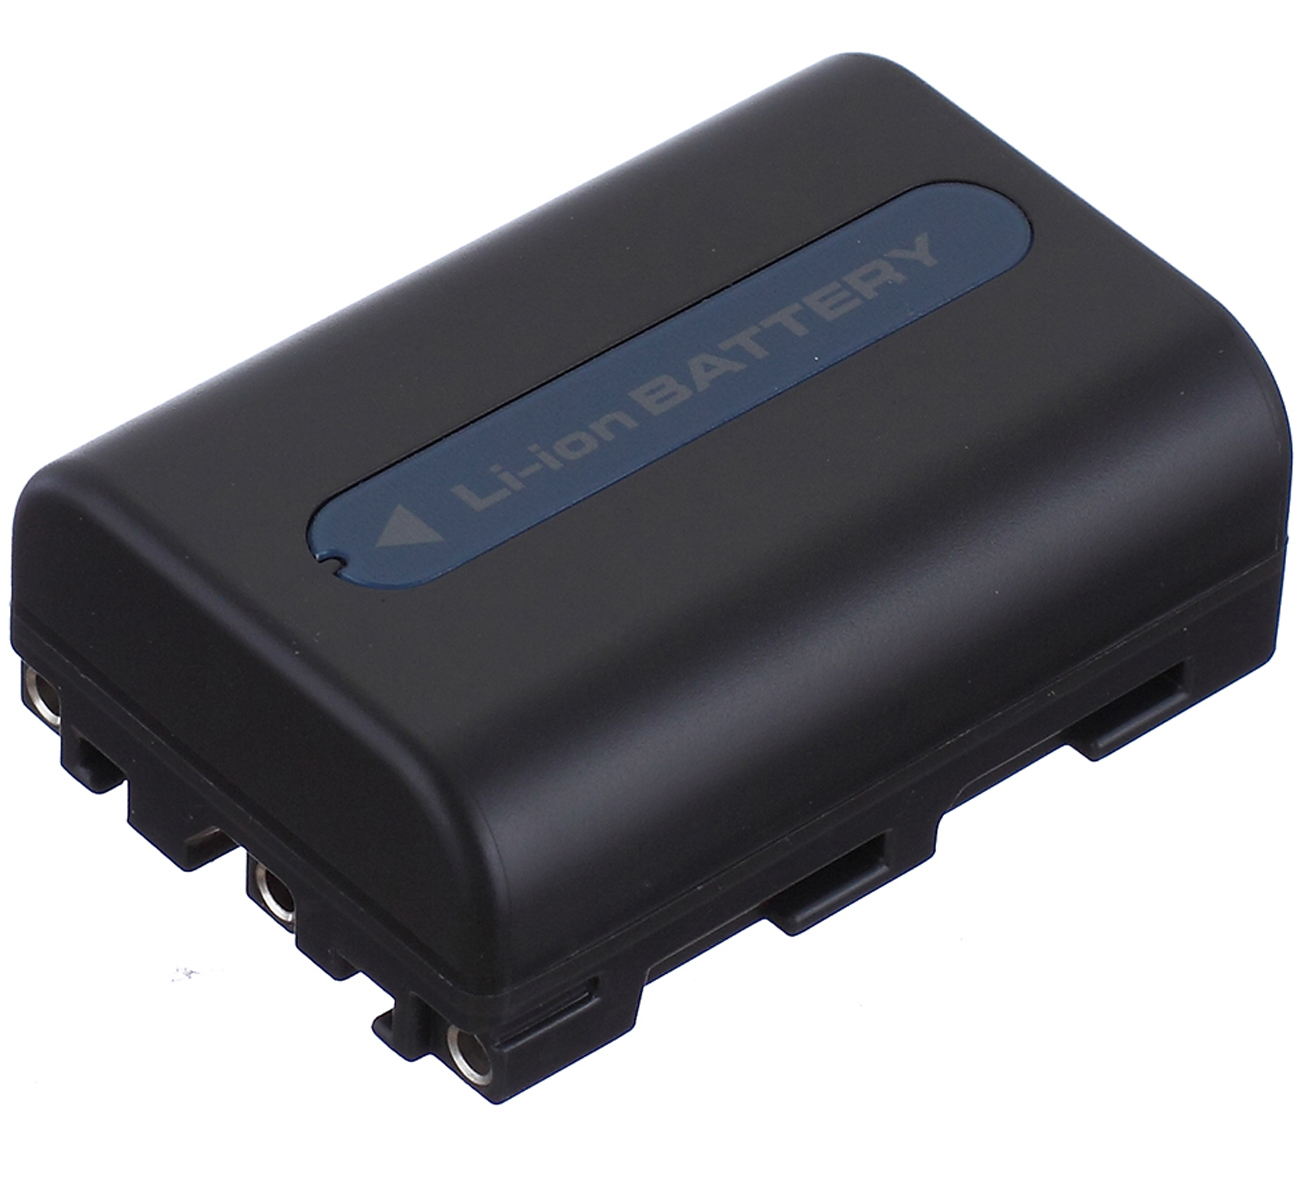 Power Smart 4200mah batería para Sony ccd-trv10e ccd-trv112 ccd-trv11e ccd-trv14e